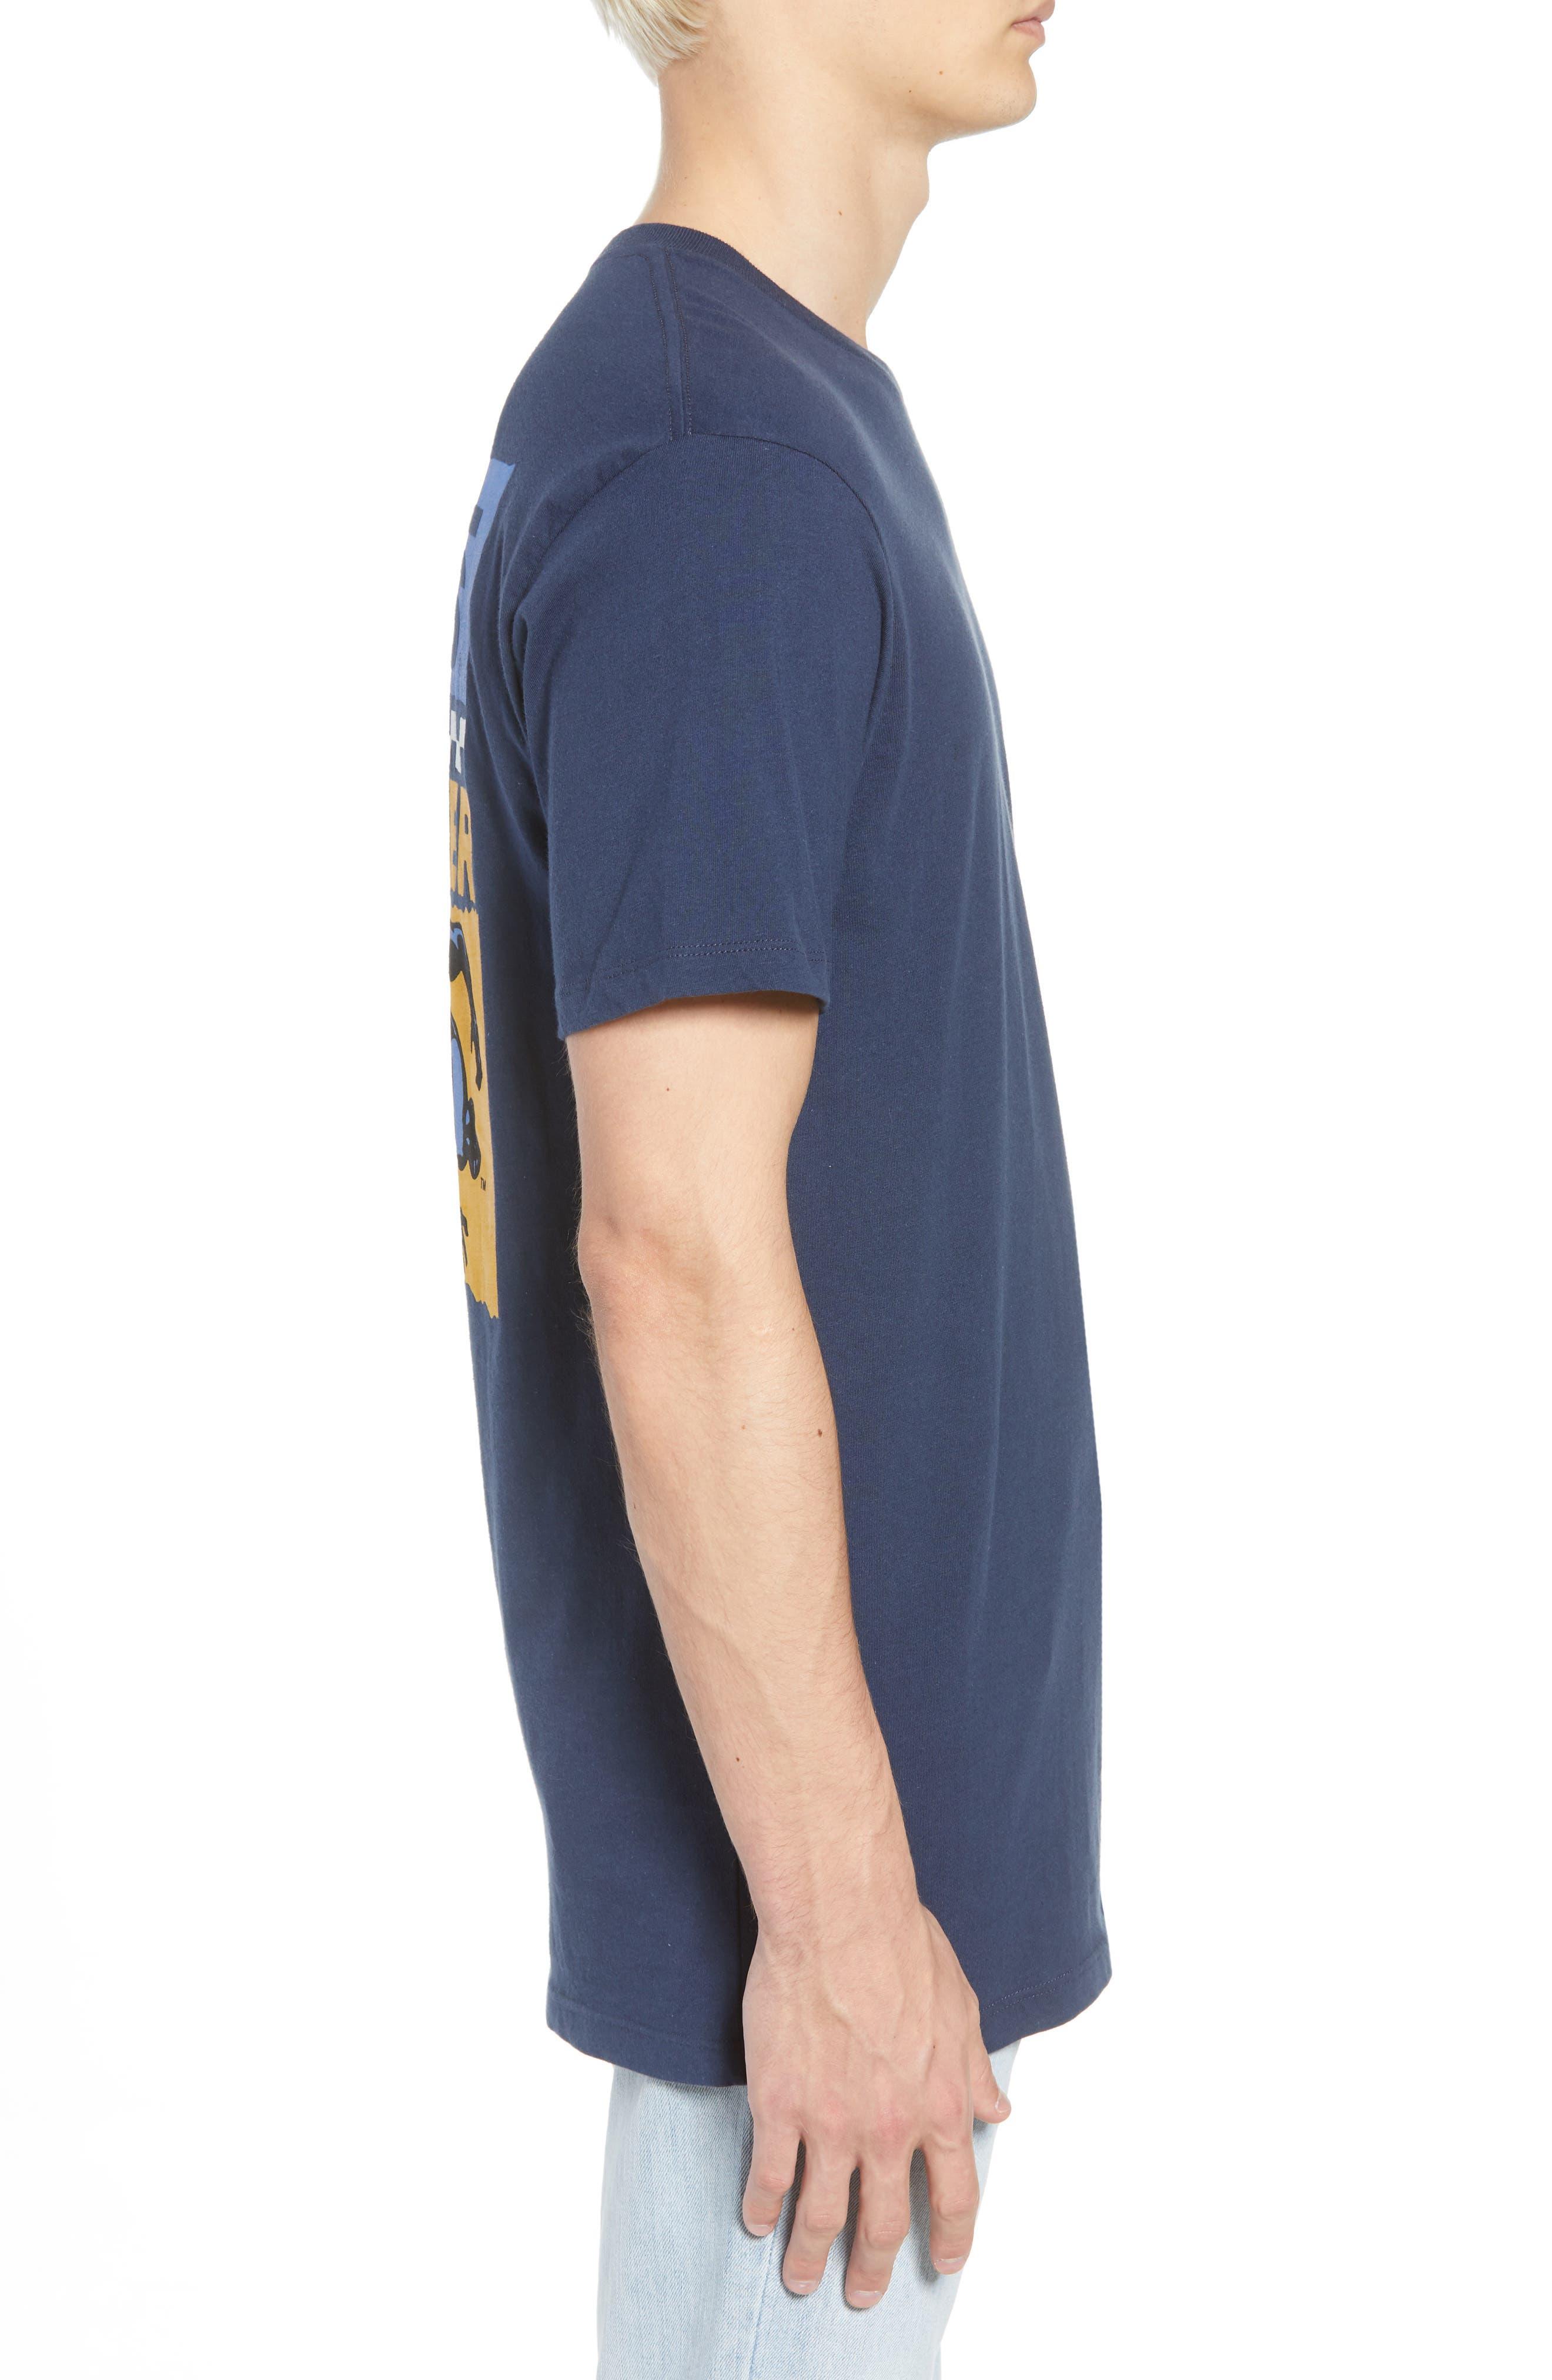 x Marvel<sup>®</sup> Black Panther T-Shirt,                             Alternate thumbnail 3, color,                             Dress Blues